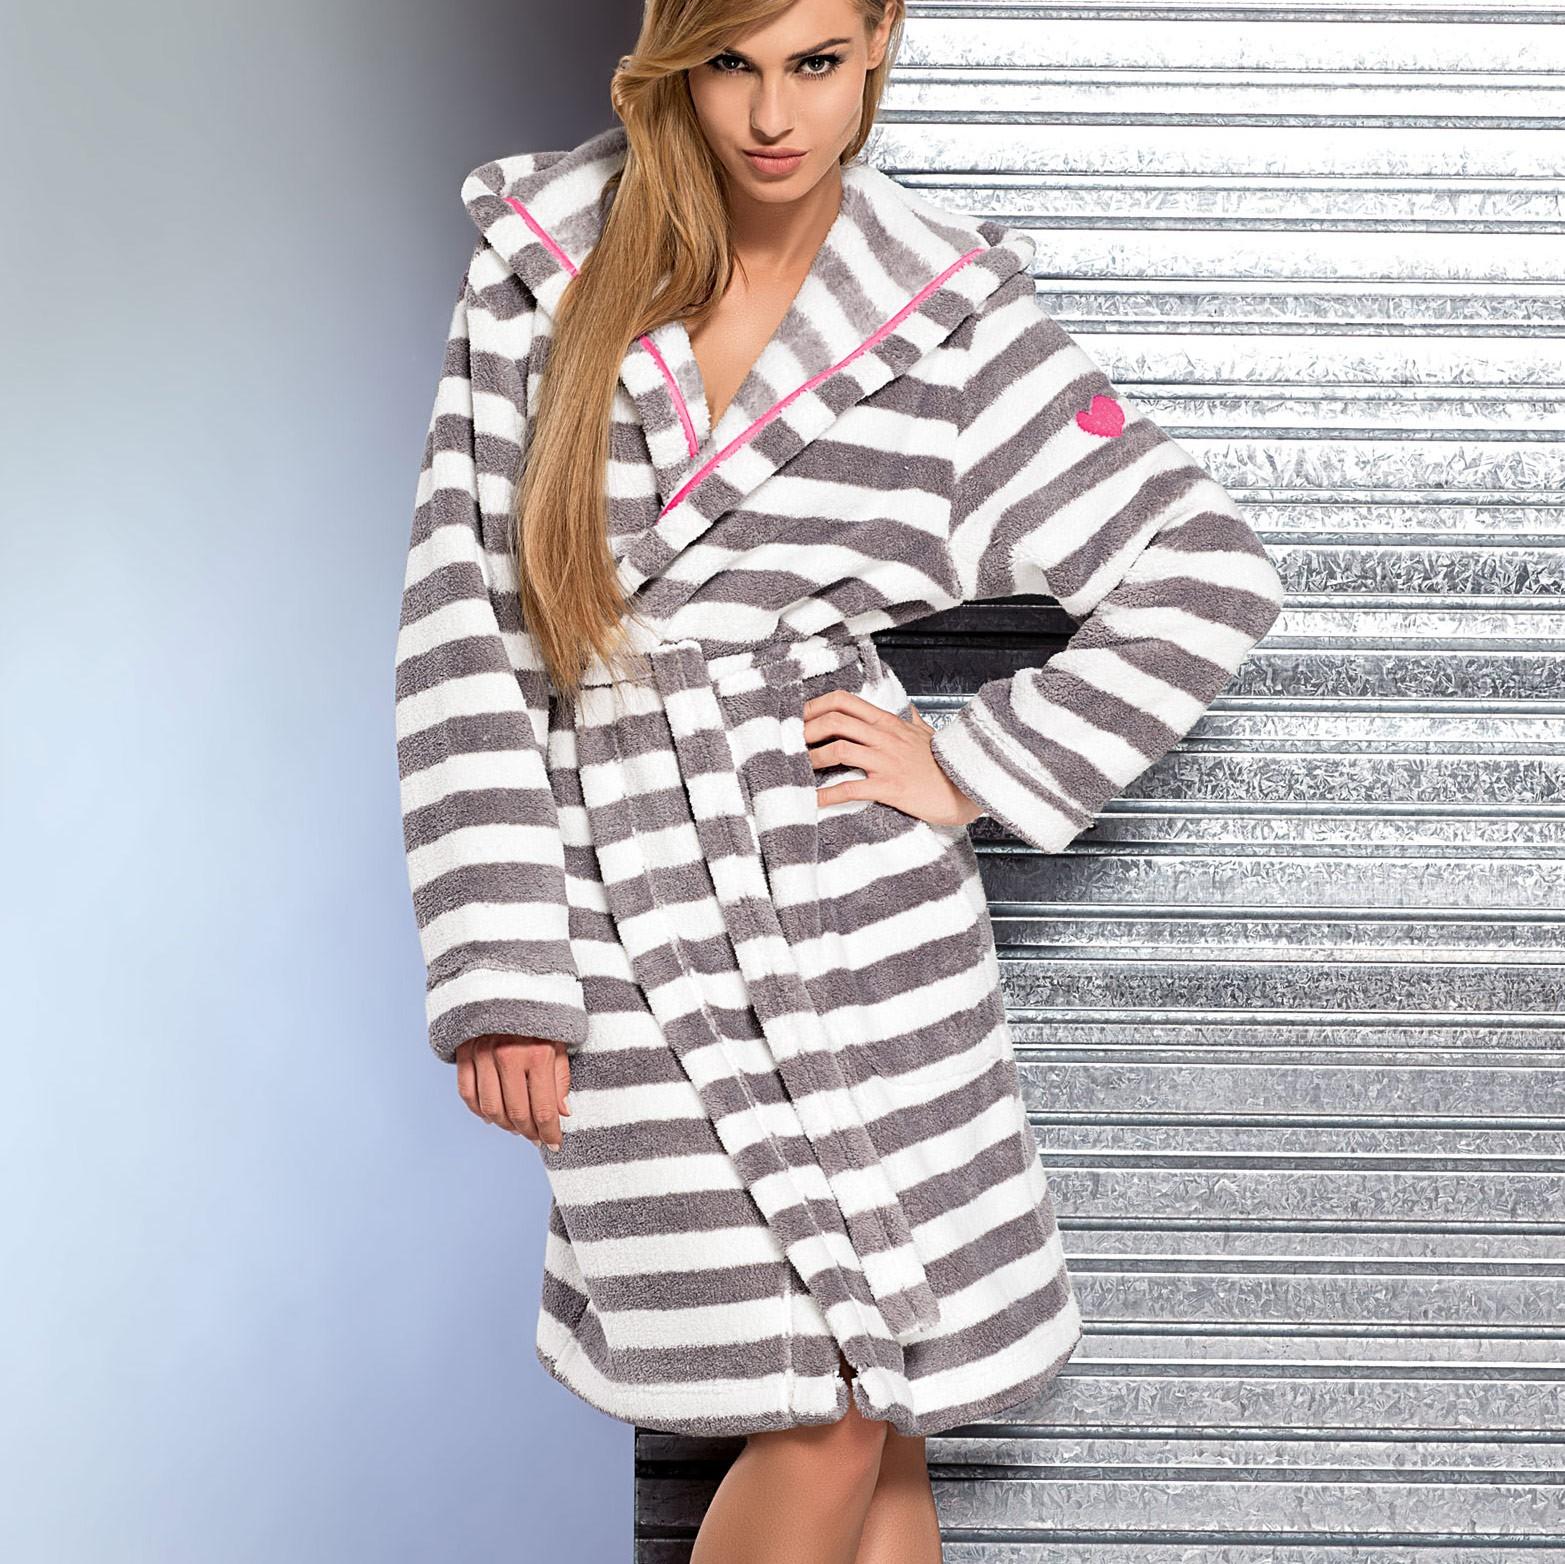 Robe De Chambre Ado Idee Pour S Habiller